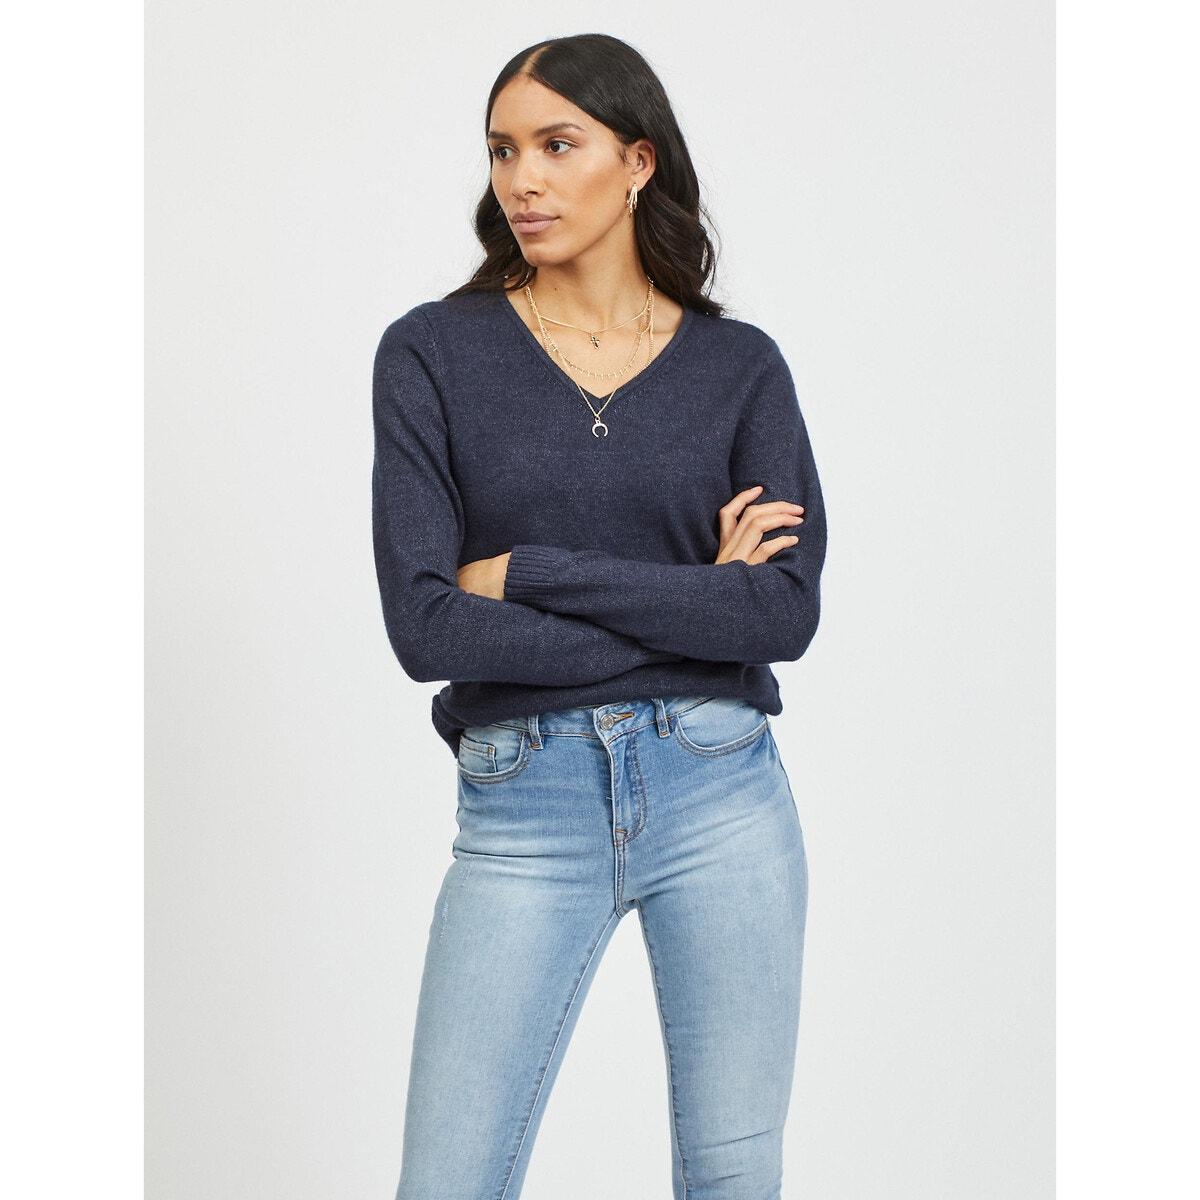 V-Neck Fine Gauge Knit Jumper Sweater γυναικα   πλεκτά   ζακέτες   πλεκτά